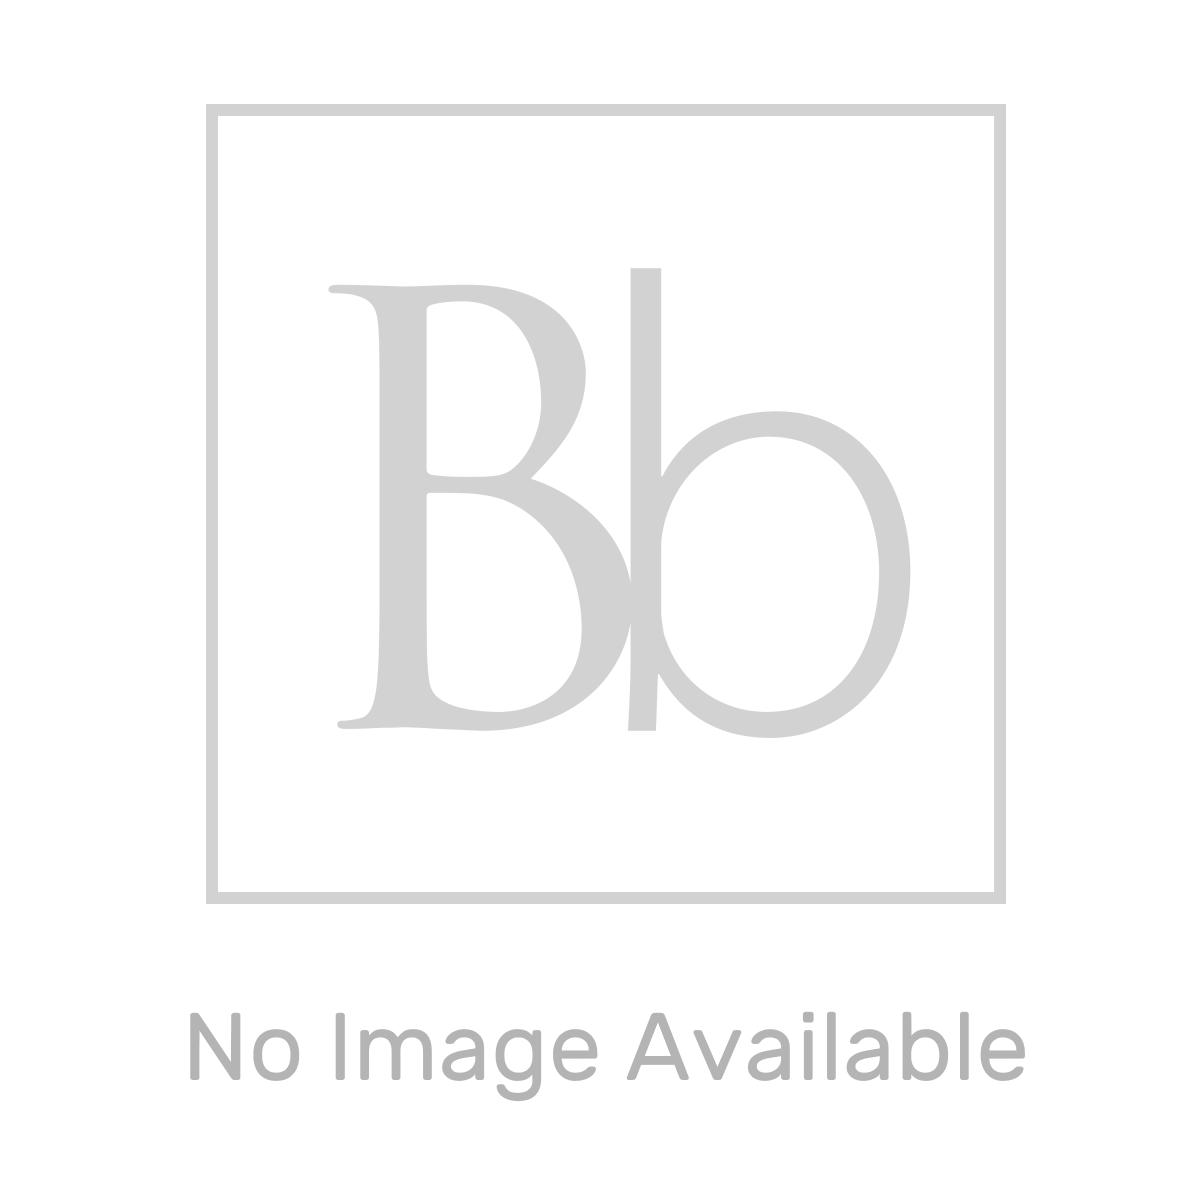 Aquadart White Slate Shower Tray 1700 x 800 Lifestyle